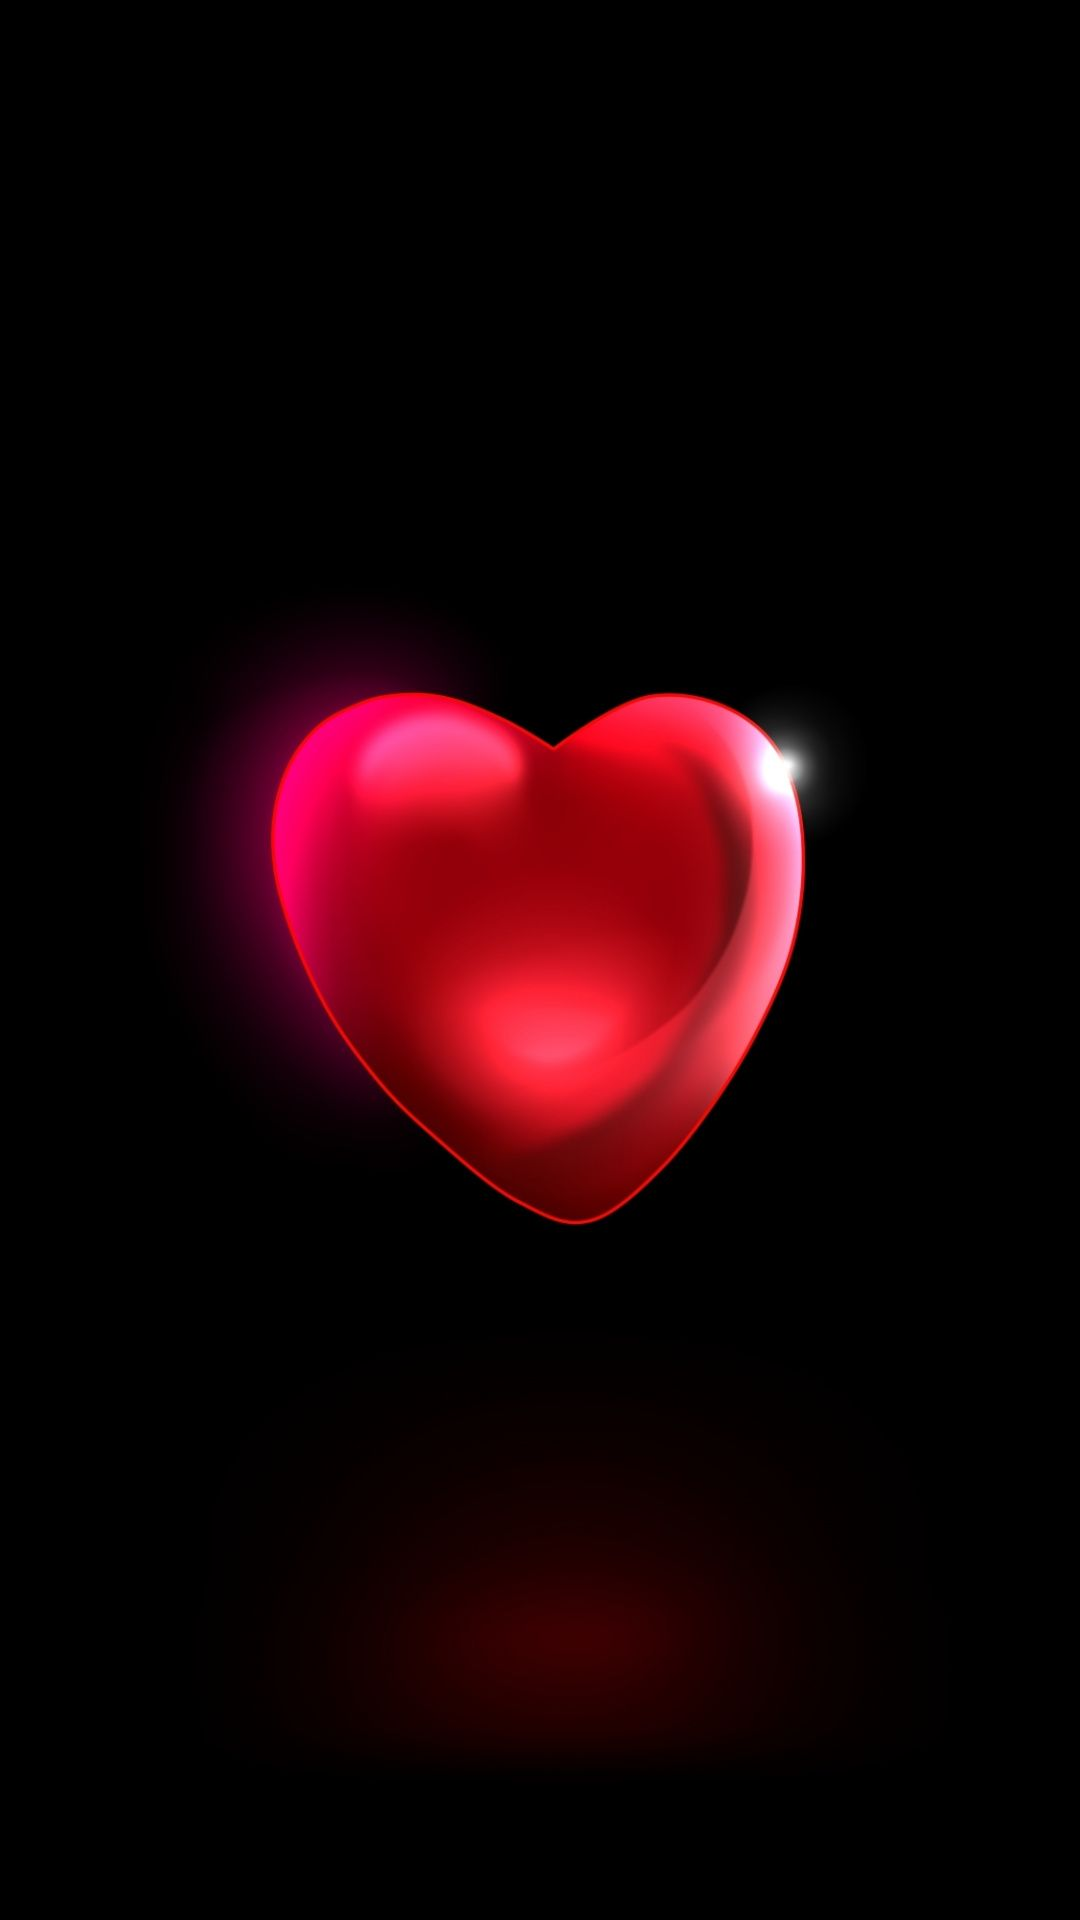 Minimal Red Heart 3d Wallpaper Heart Wallpaper Iphone Background Iphone Wallpaper